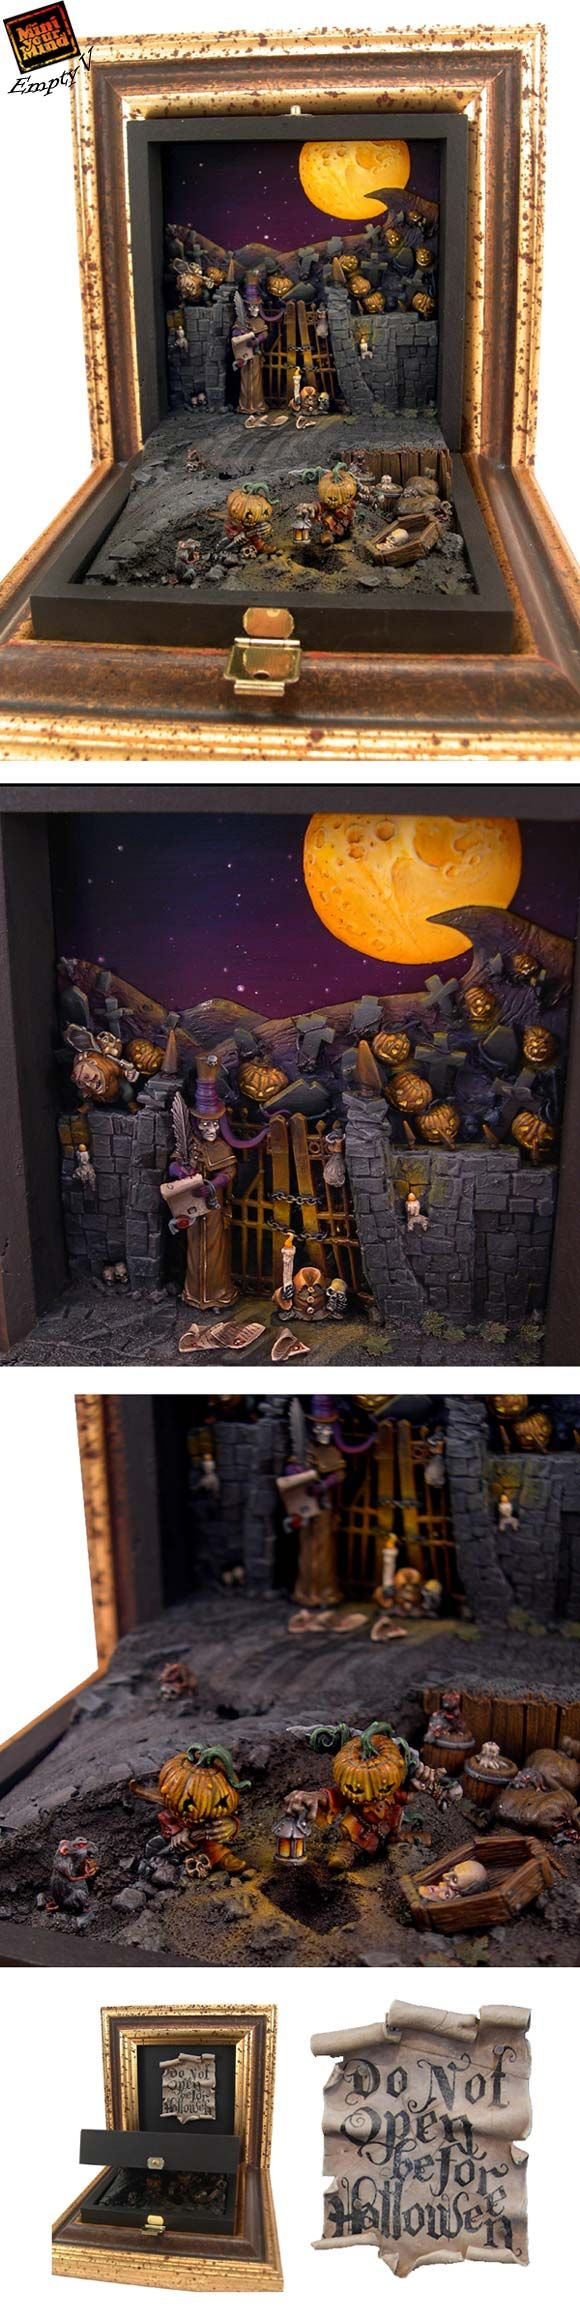 do not open before halloween focus on both big scene - Miniature Halloween Decorations